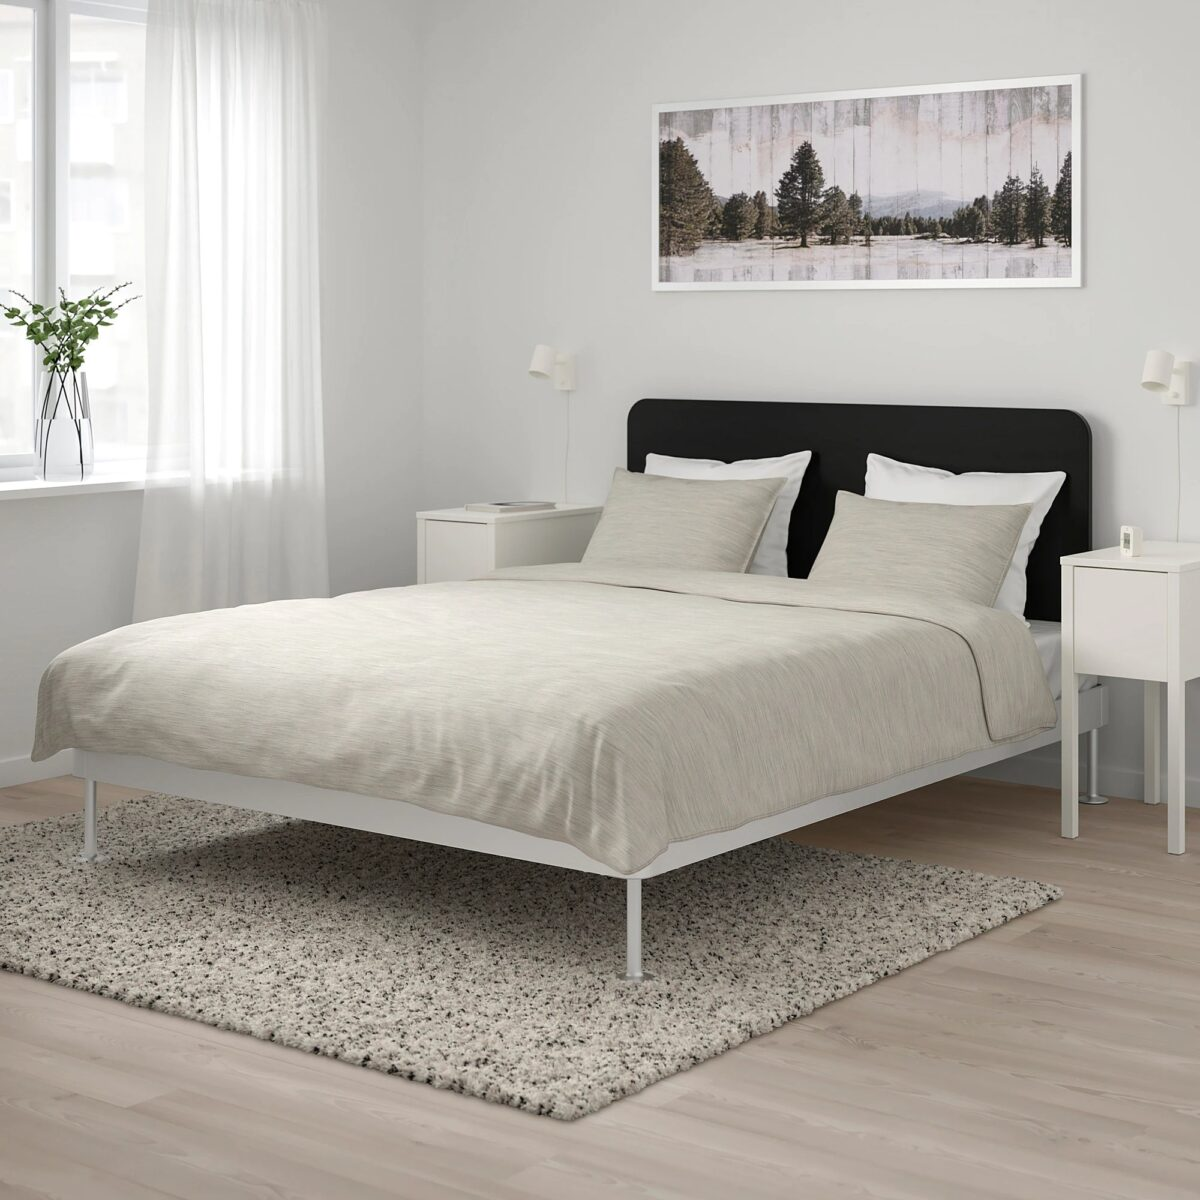 delaktig-struttura-letto-